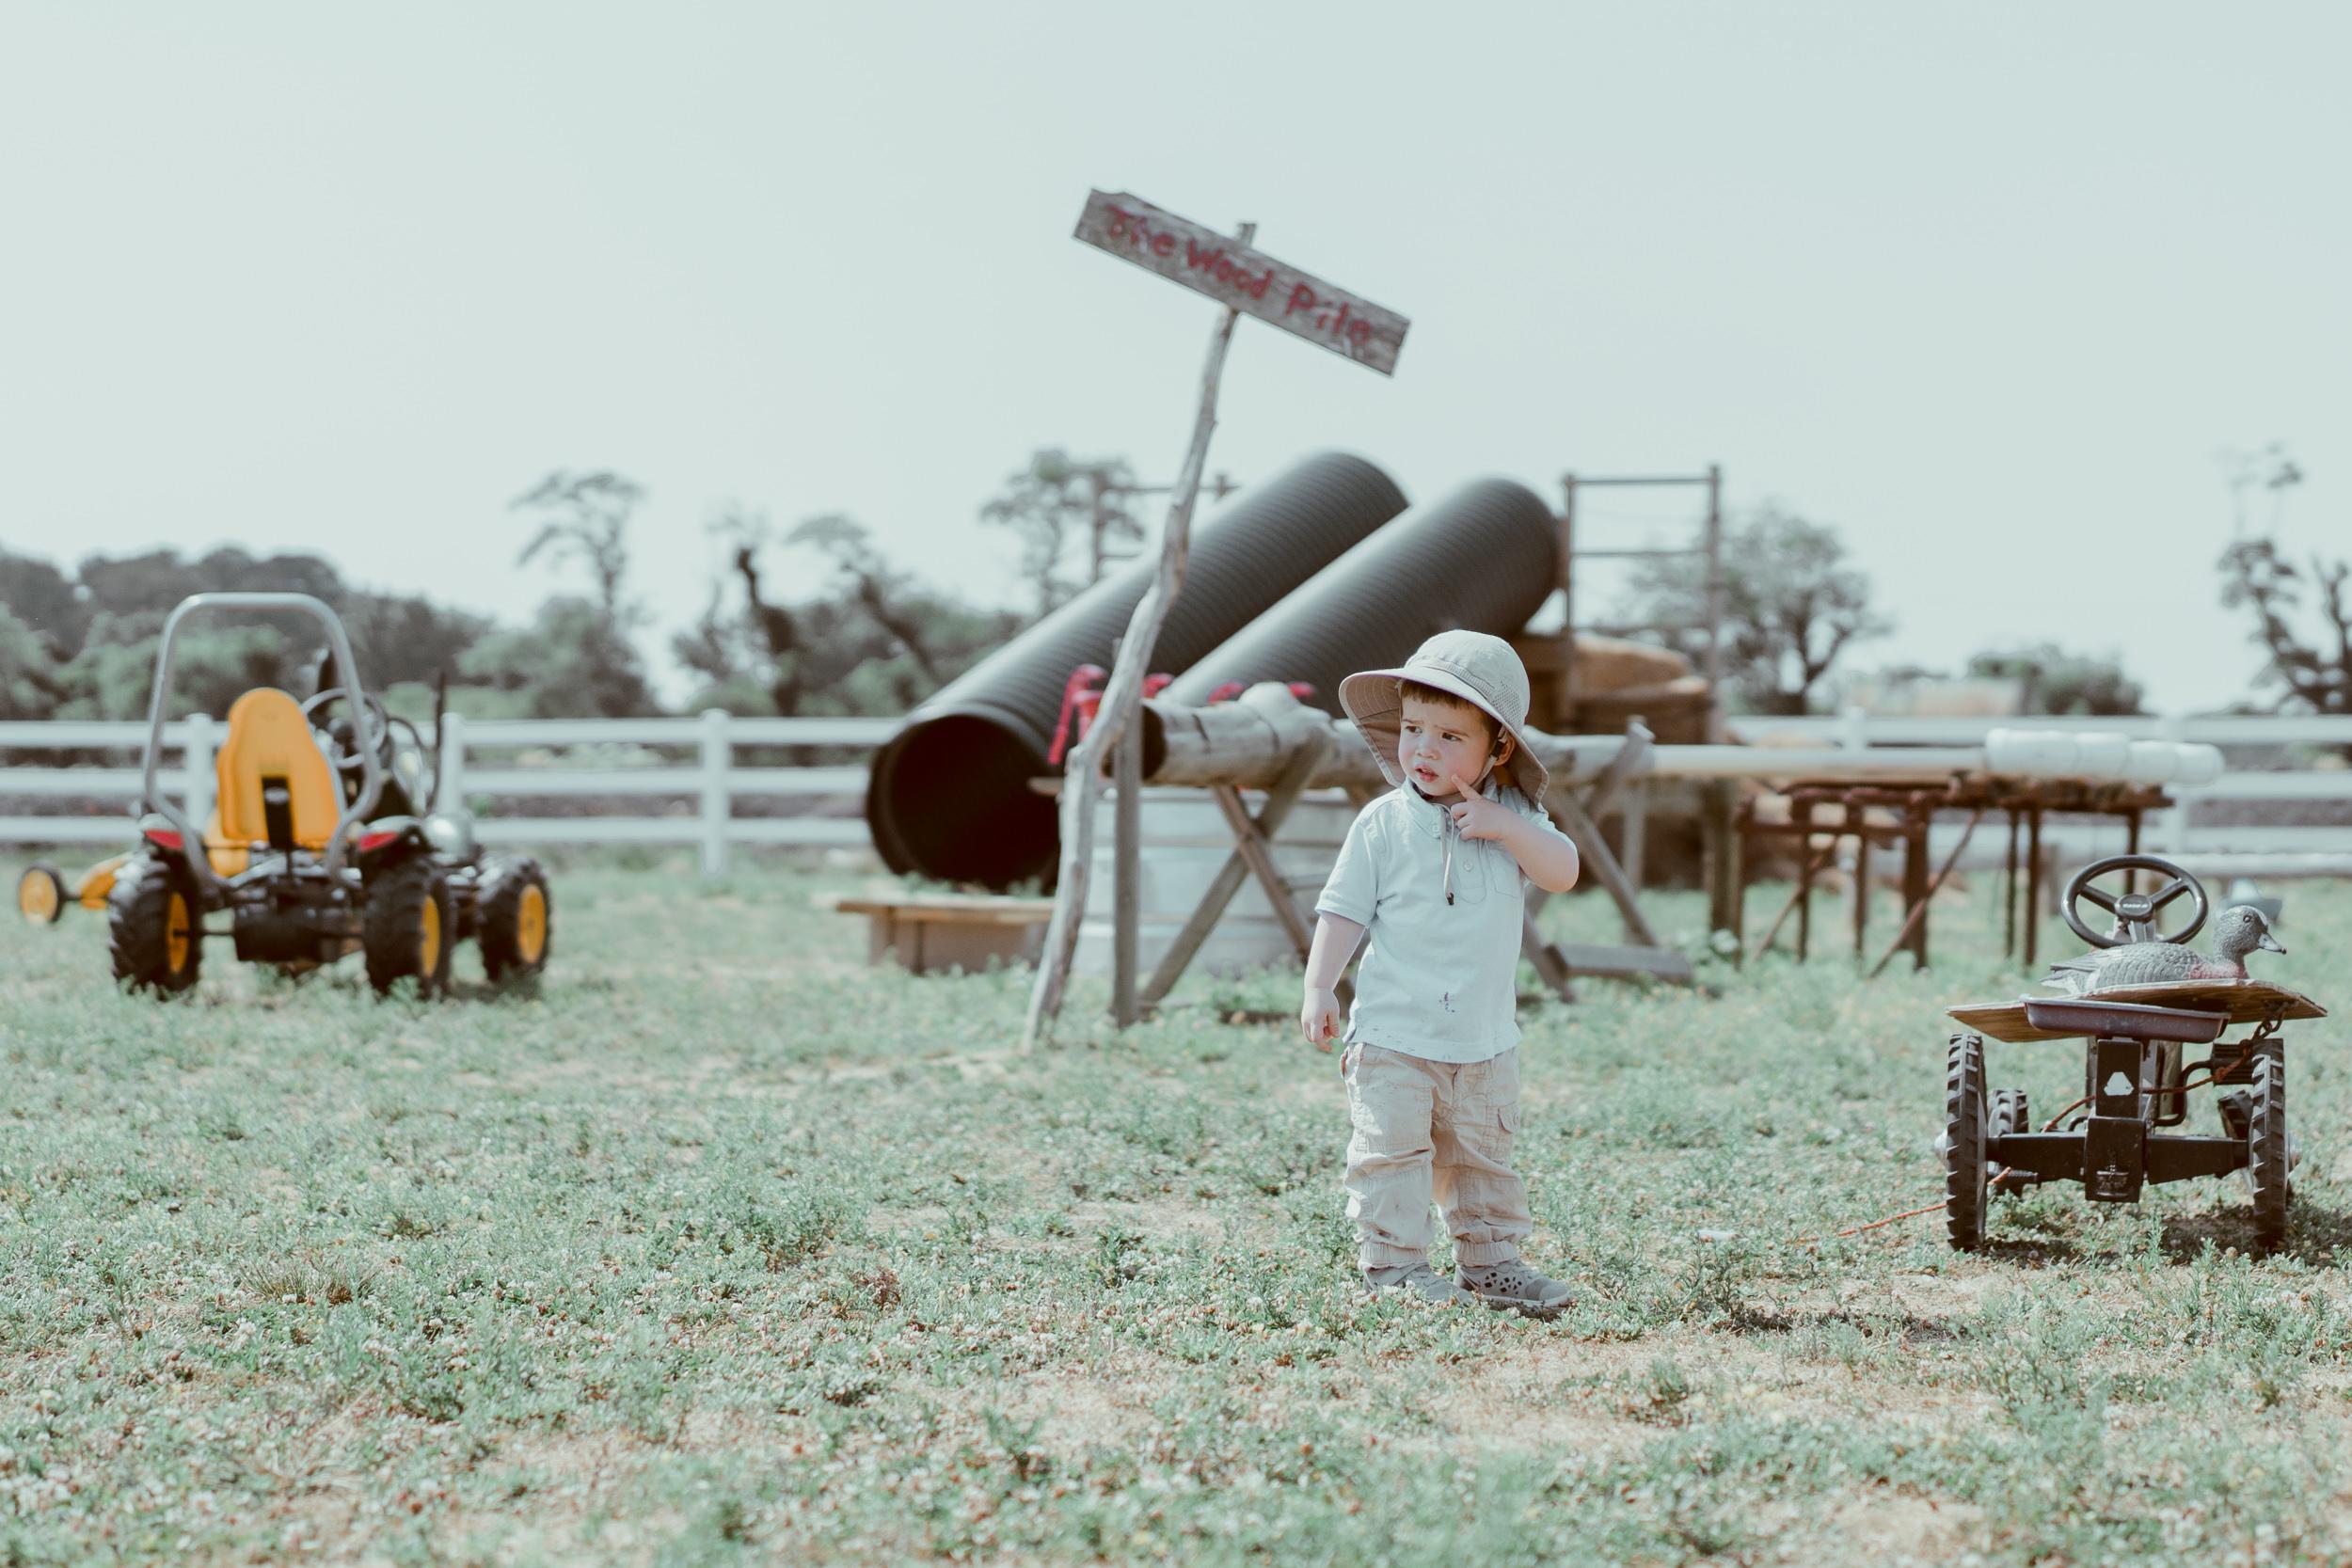 Orion at Cullipher Farm 2019-05-30-17-2.jpg